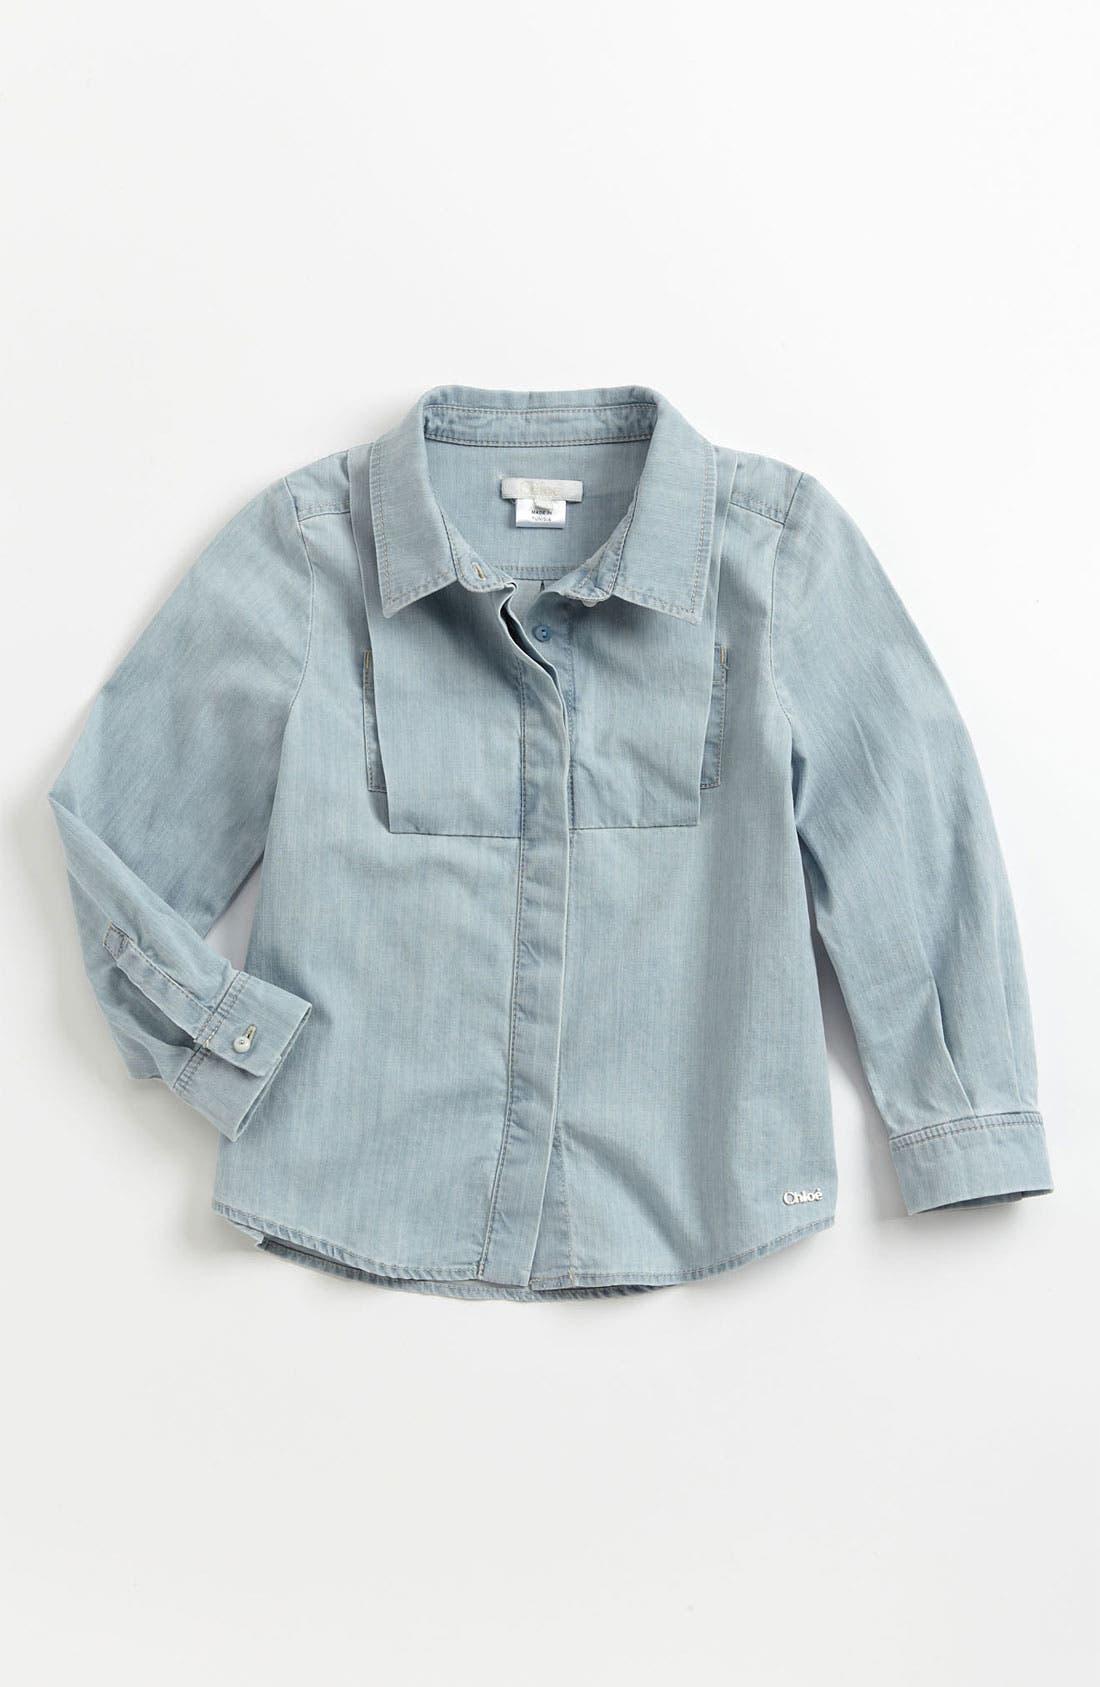 Alternate Image 1 Selected - Chloé Chambray Shirt (Little Girls & Big Girls)